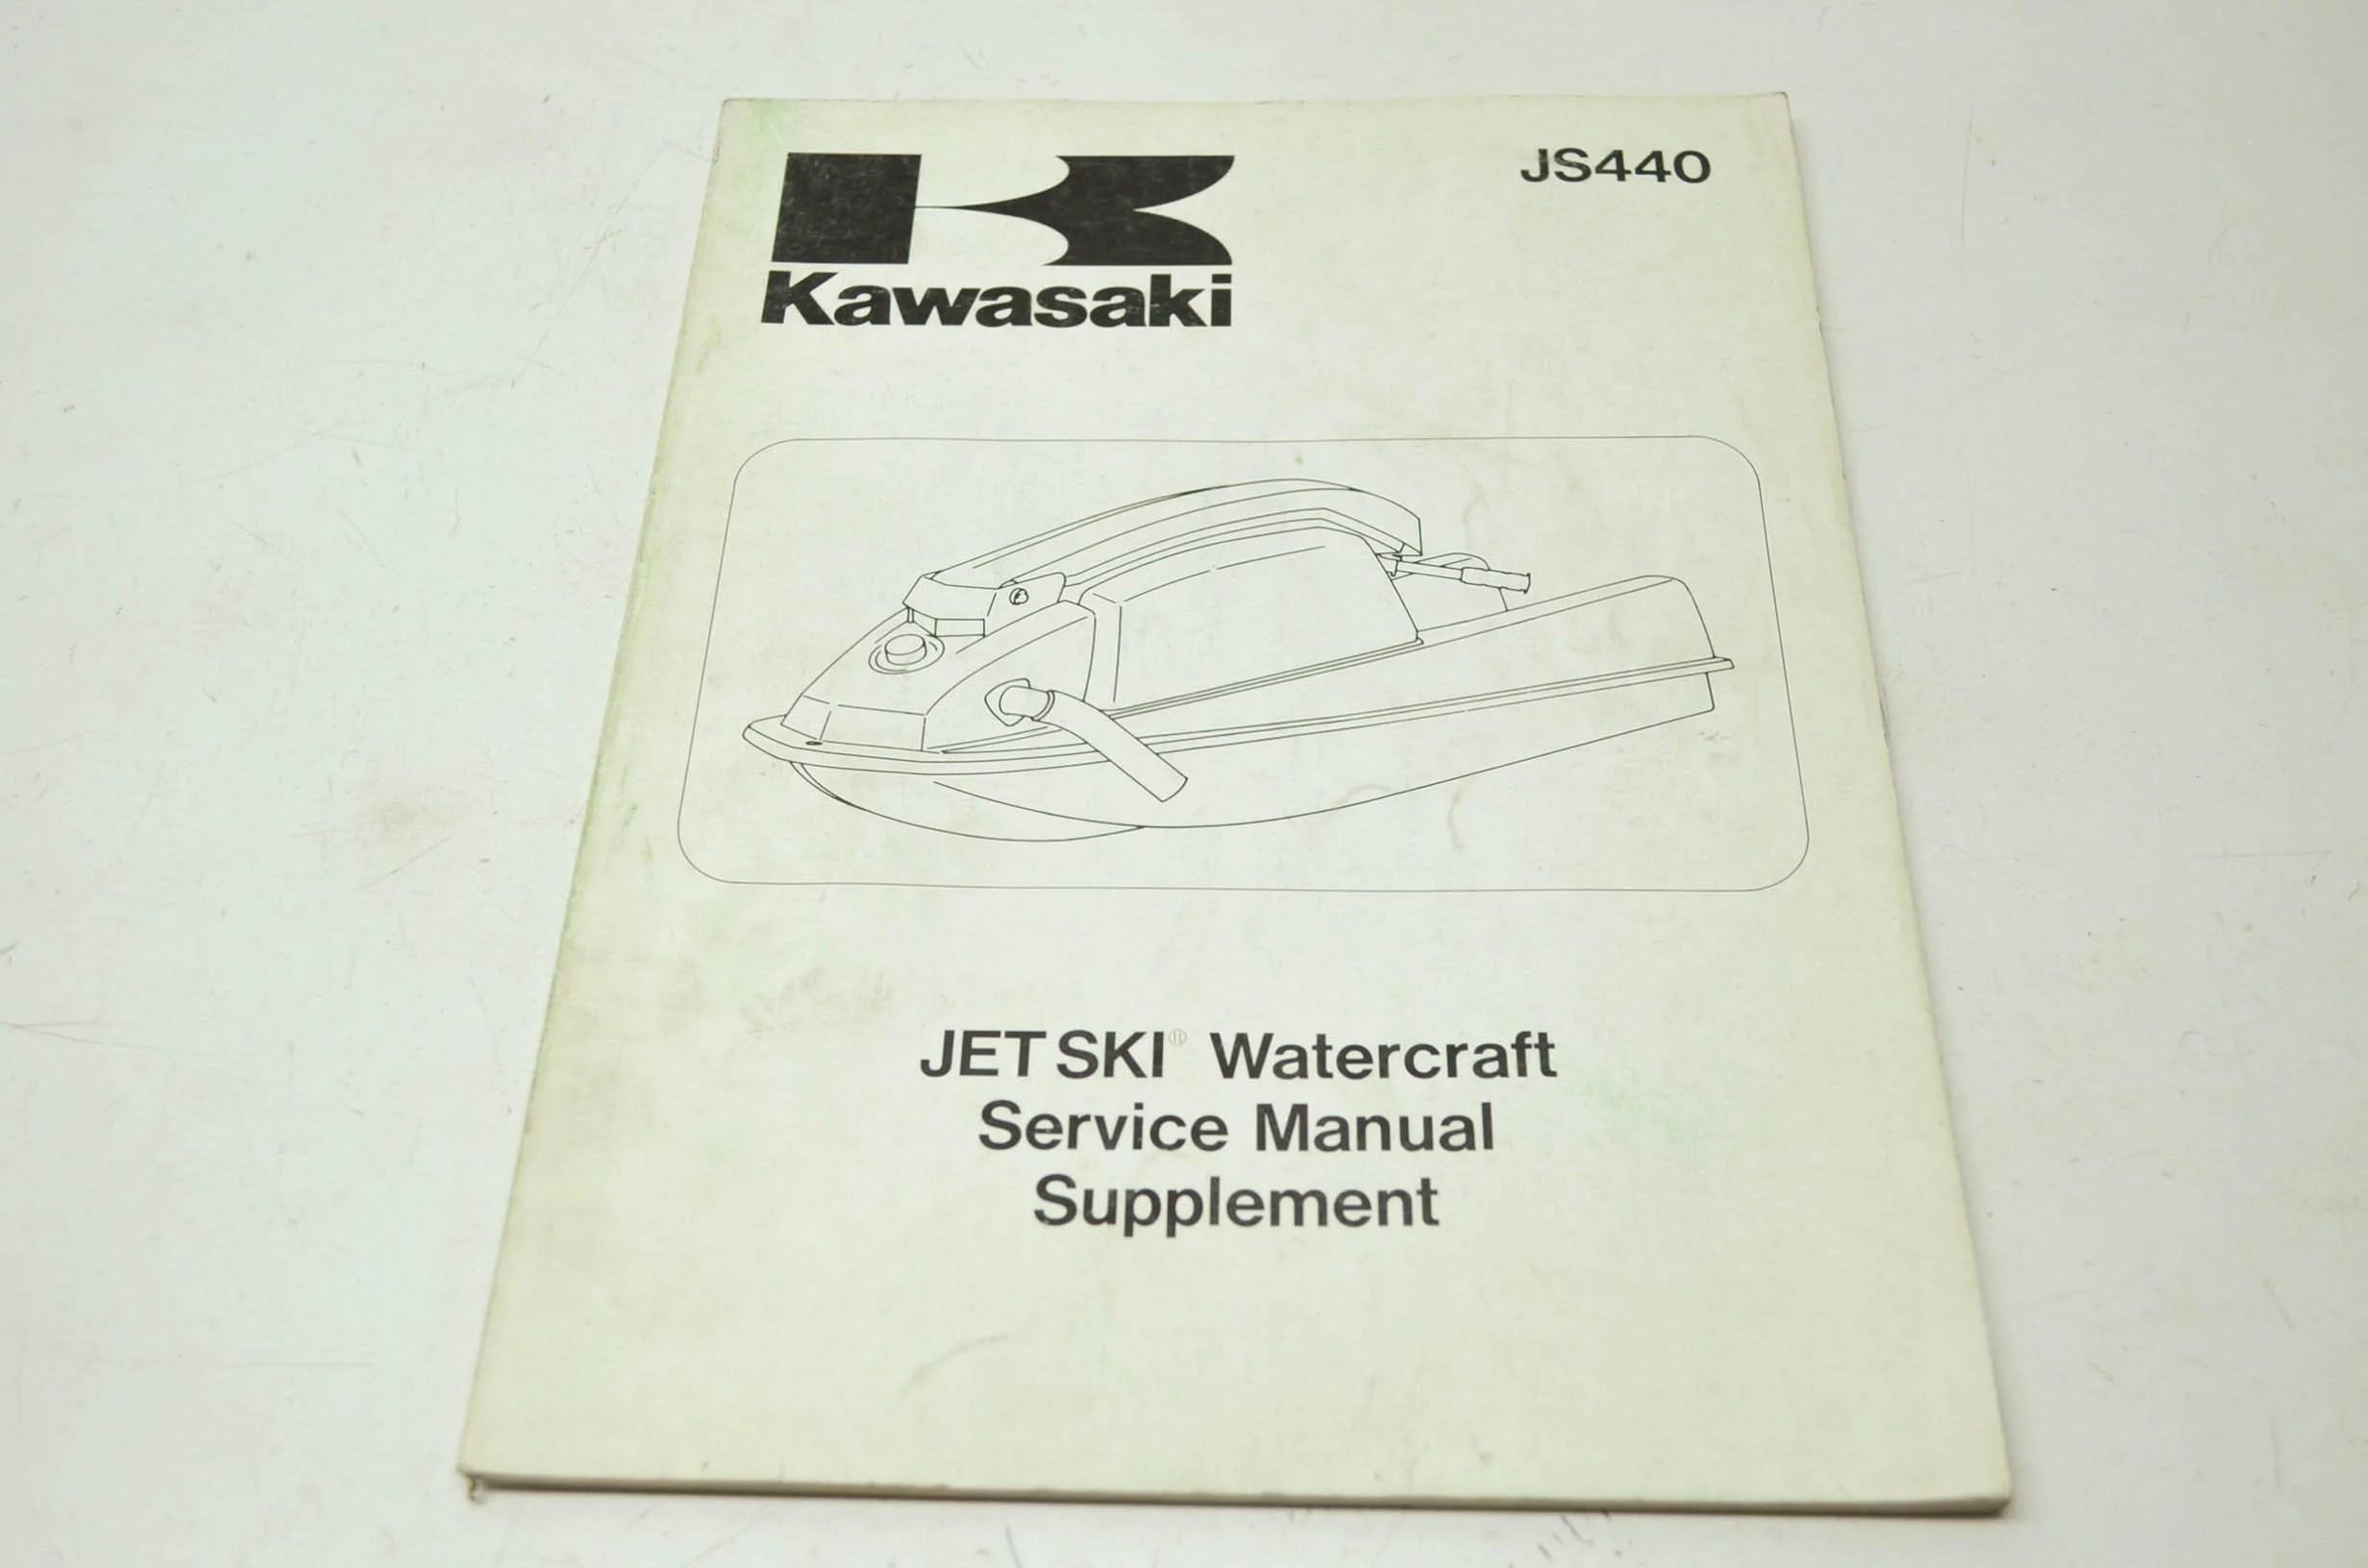 medium resolution of kawasaki 99924 1091 51 js440 jet ski service manual supplement qty 1 superior broom wiring diagrams